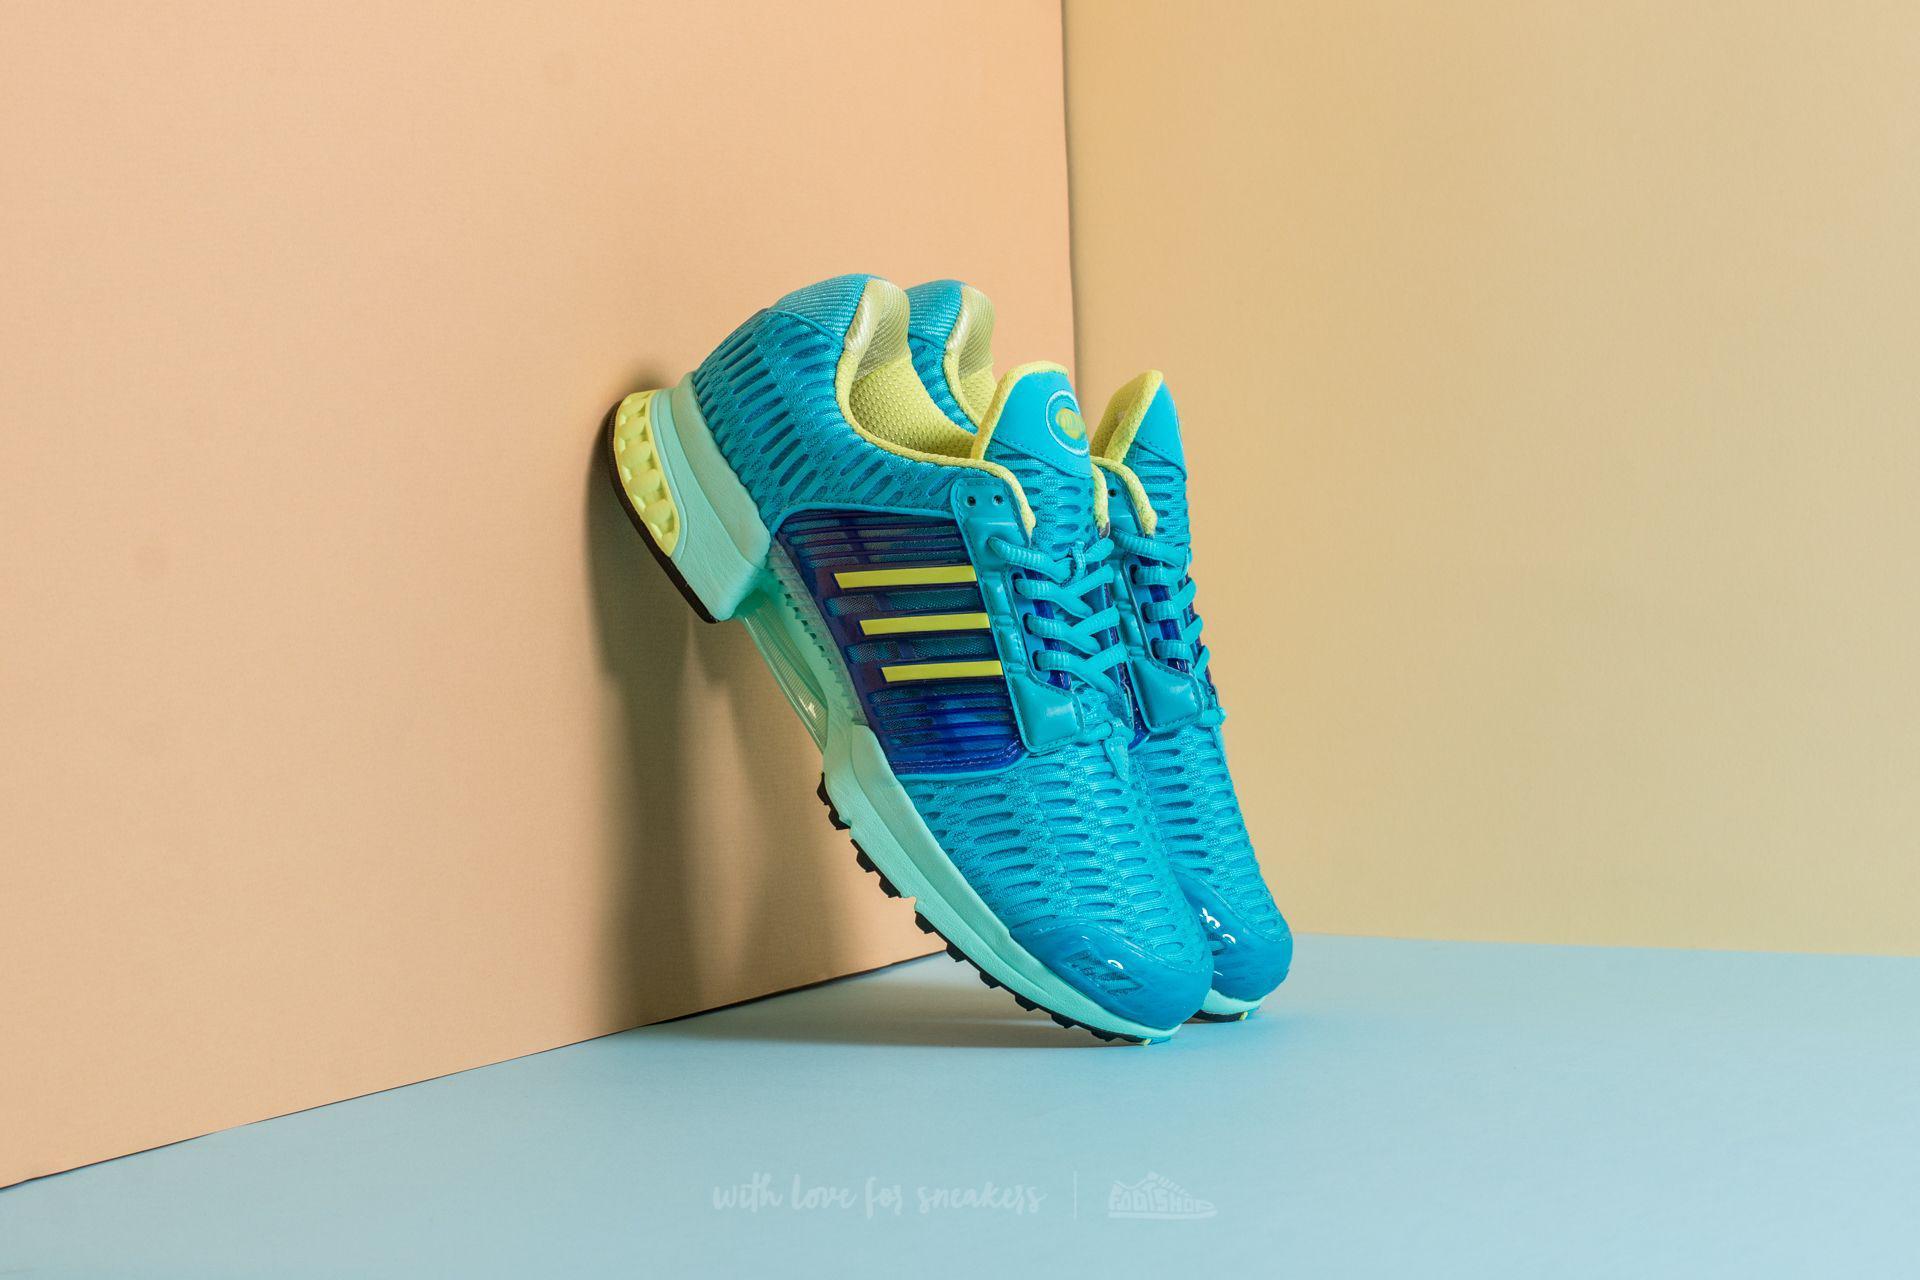 separation shoes f03fb 29d99 Lyst - adidas Originals Adidas Climacool 1 Bright Cyan Semi